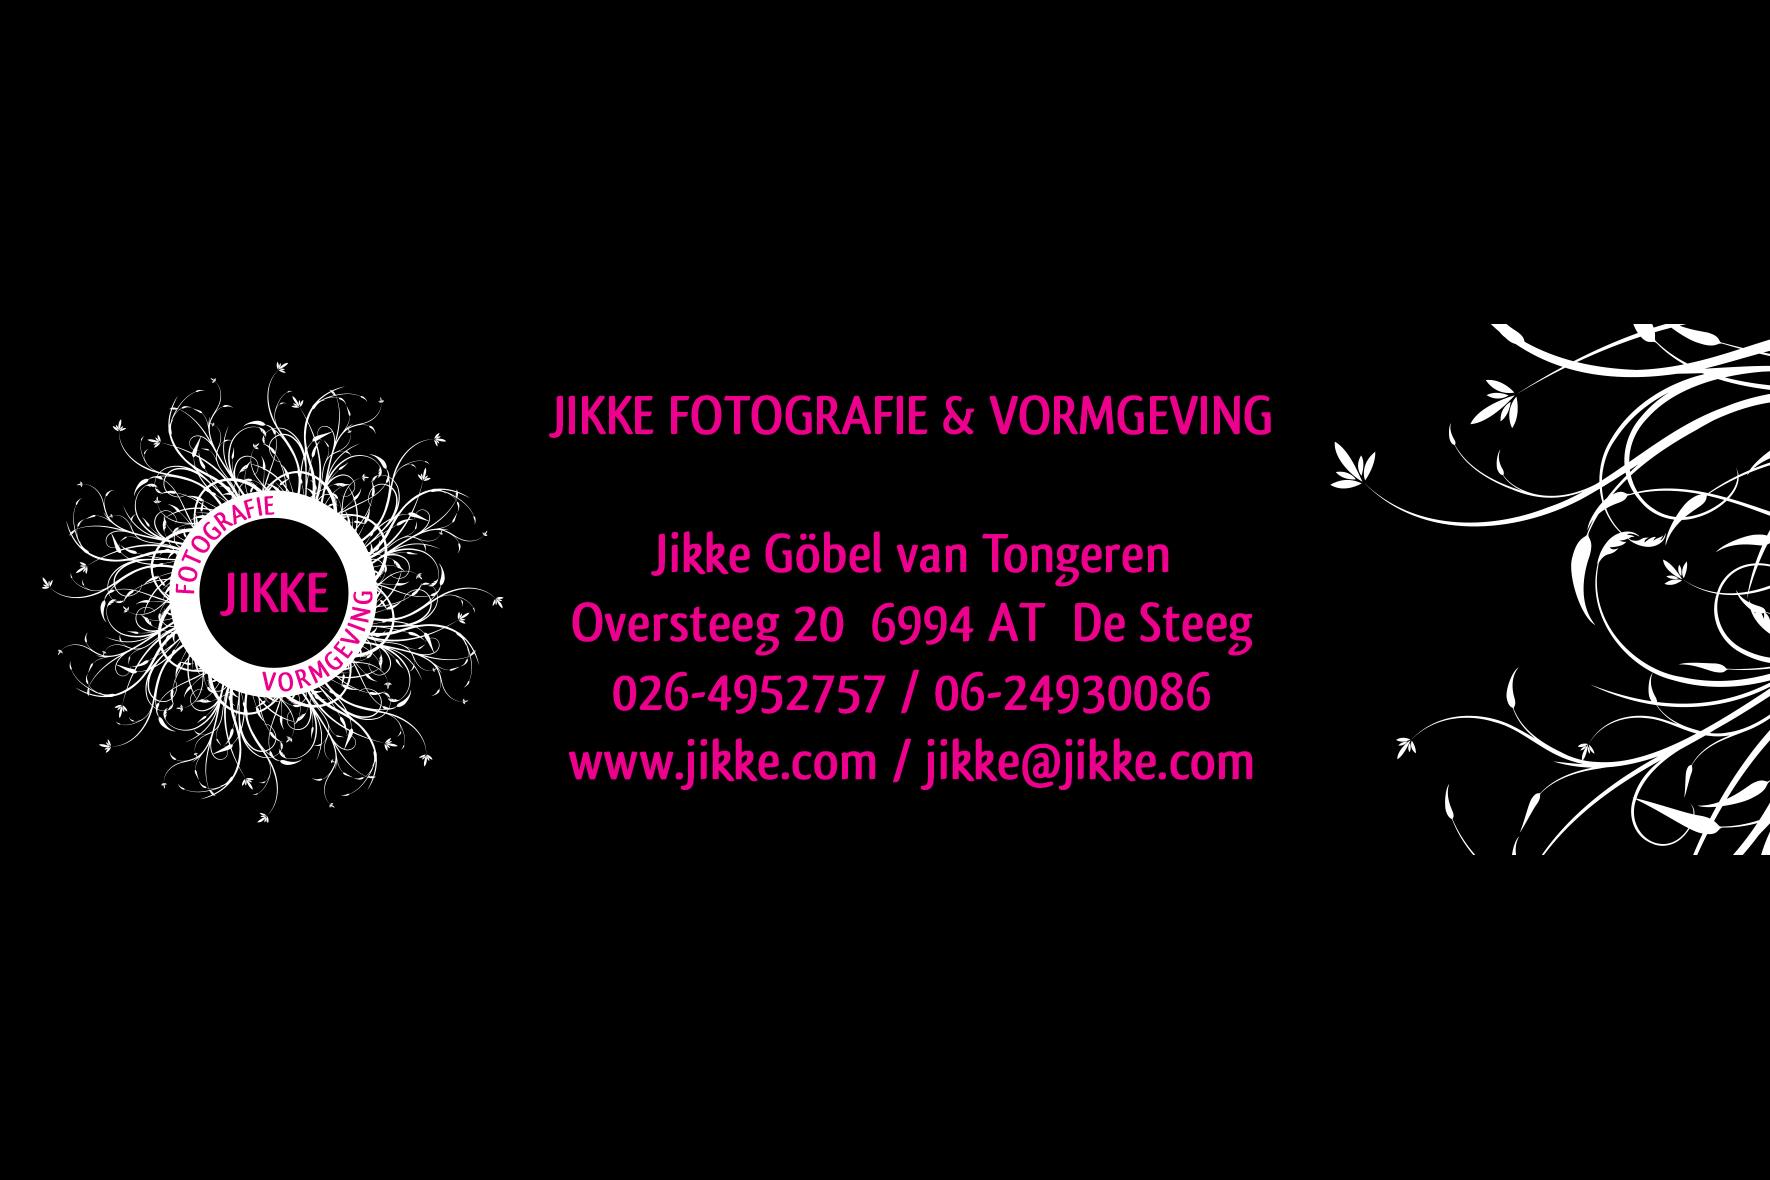 Contact Jikke